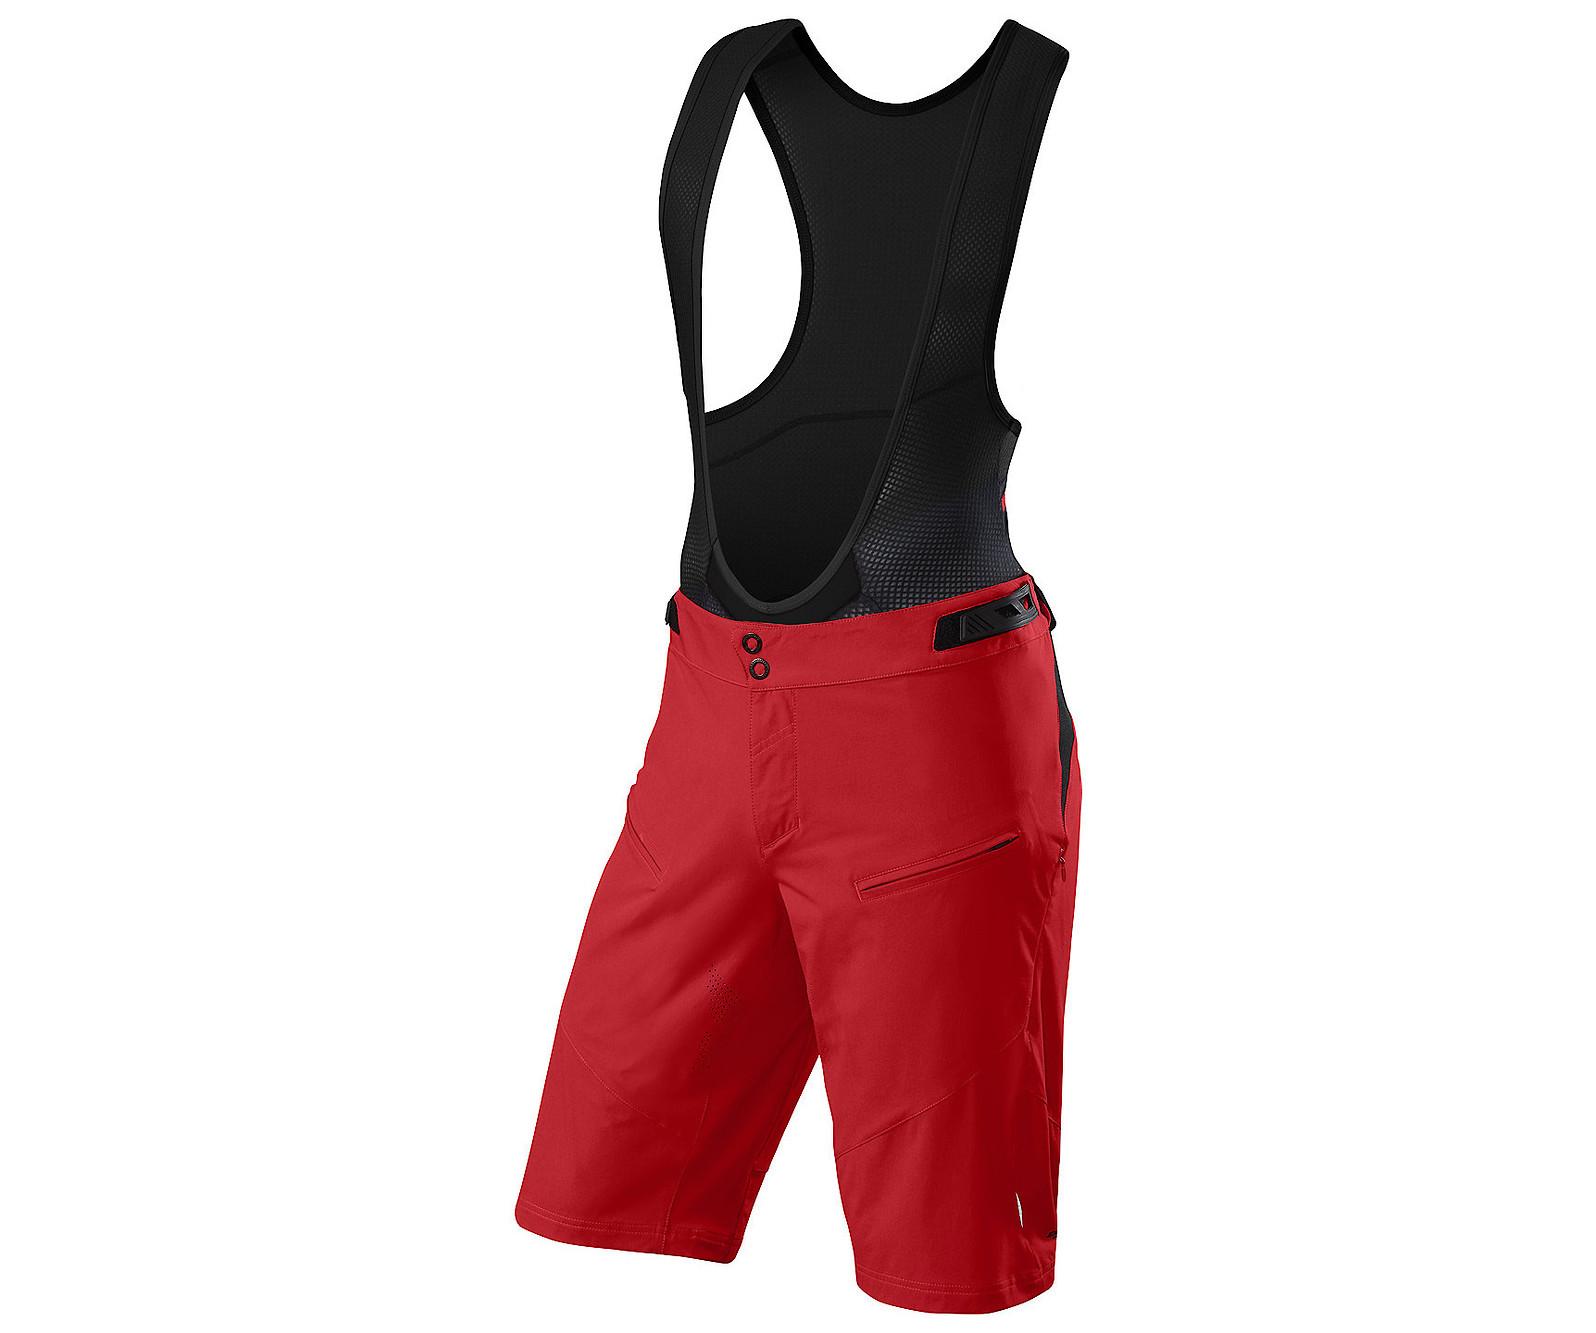 Enduro Pro Shorts - red